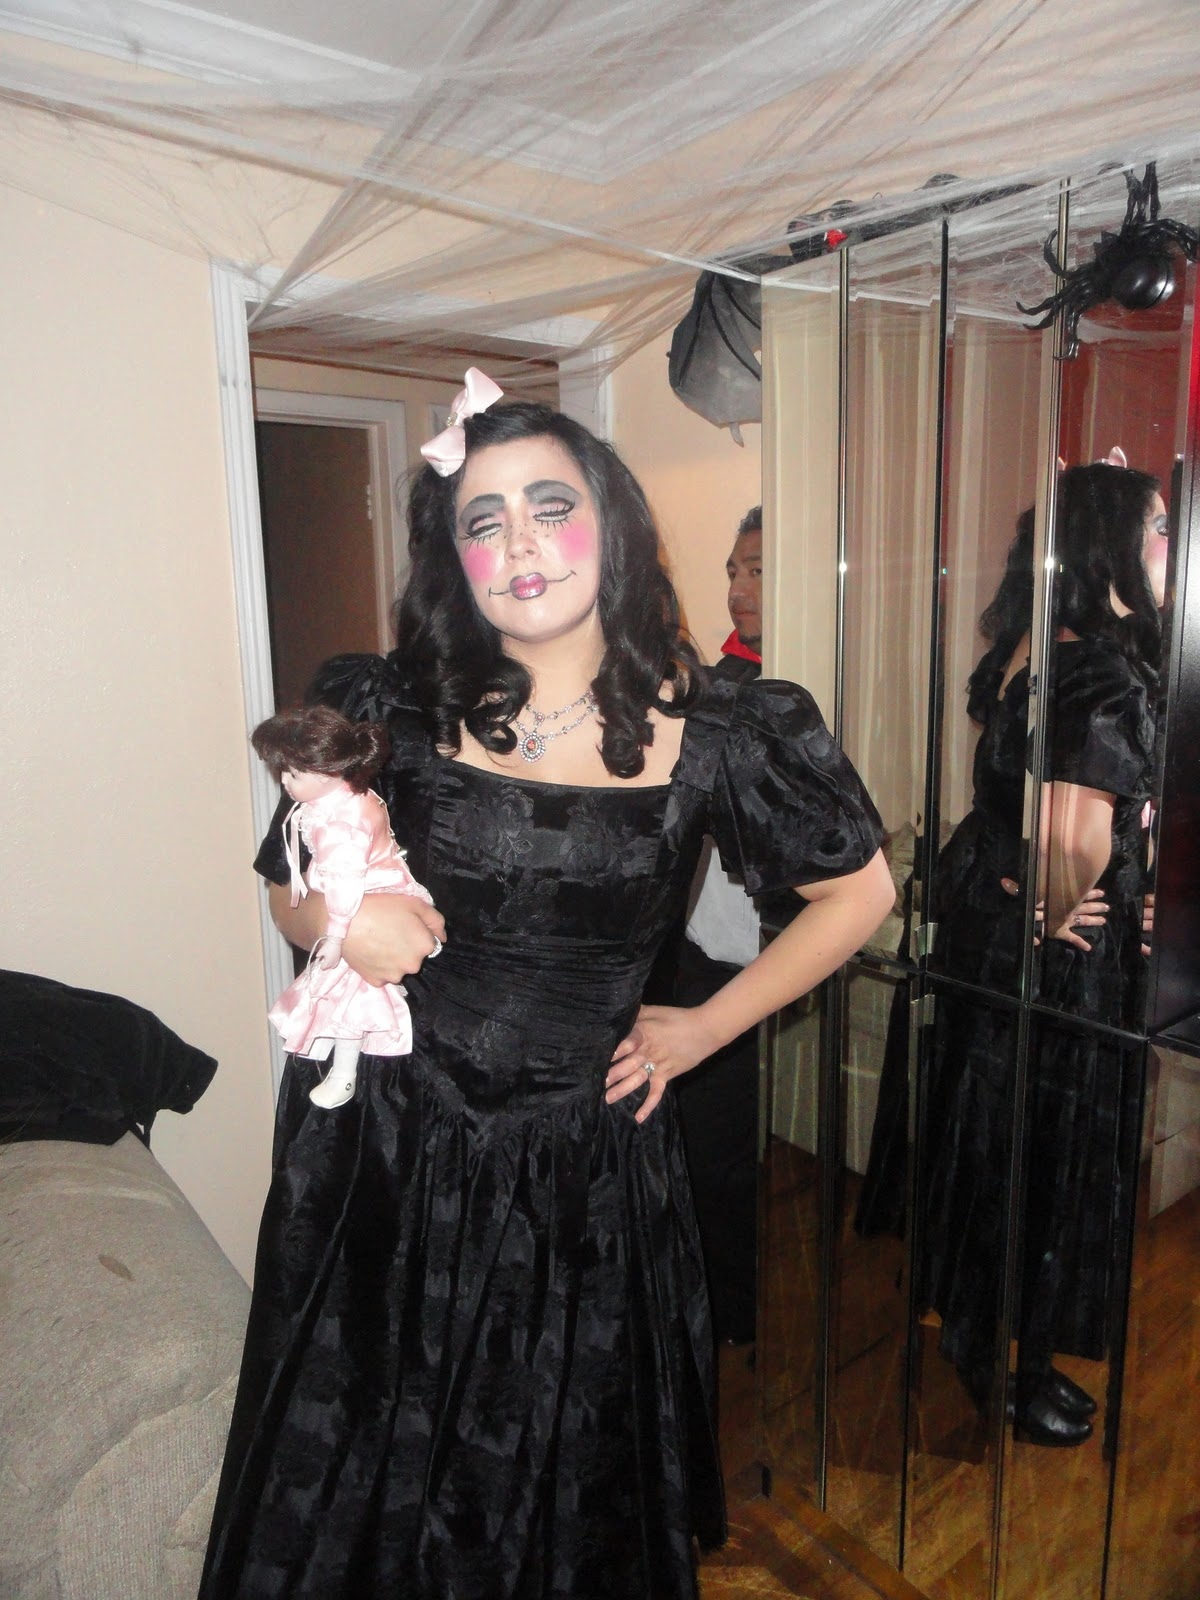 Goth Halloween Maternity Shirt Punk, Pregnancy Costume Gothic Spooky